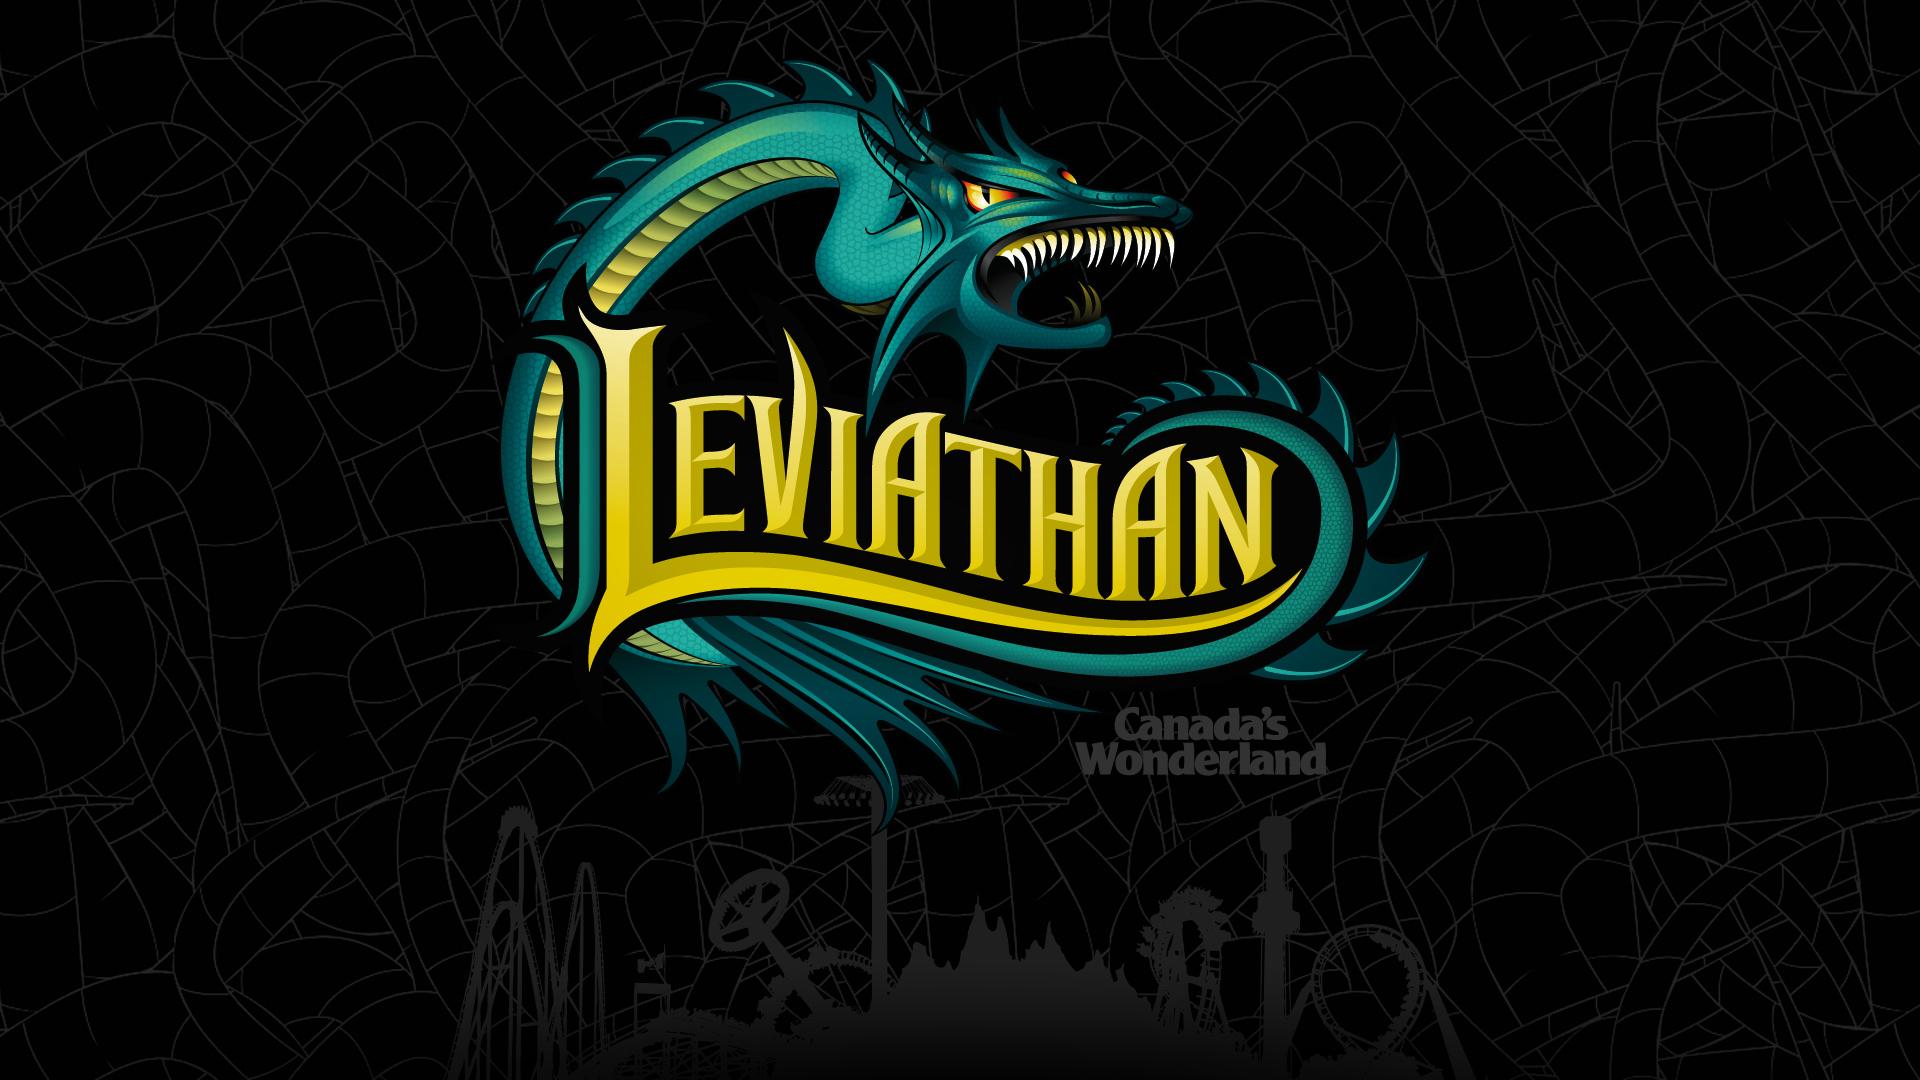 Leviathan Logo from Canada\'s Wonderland Desktop Wallpaper.